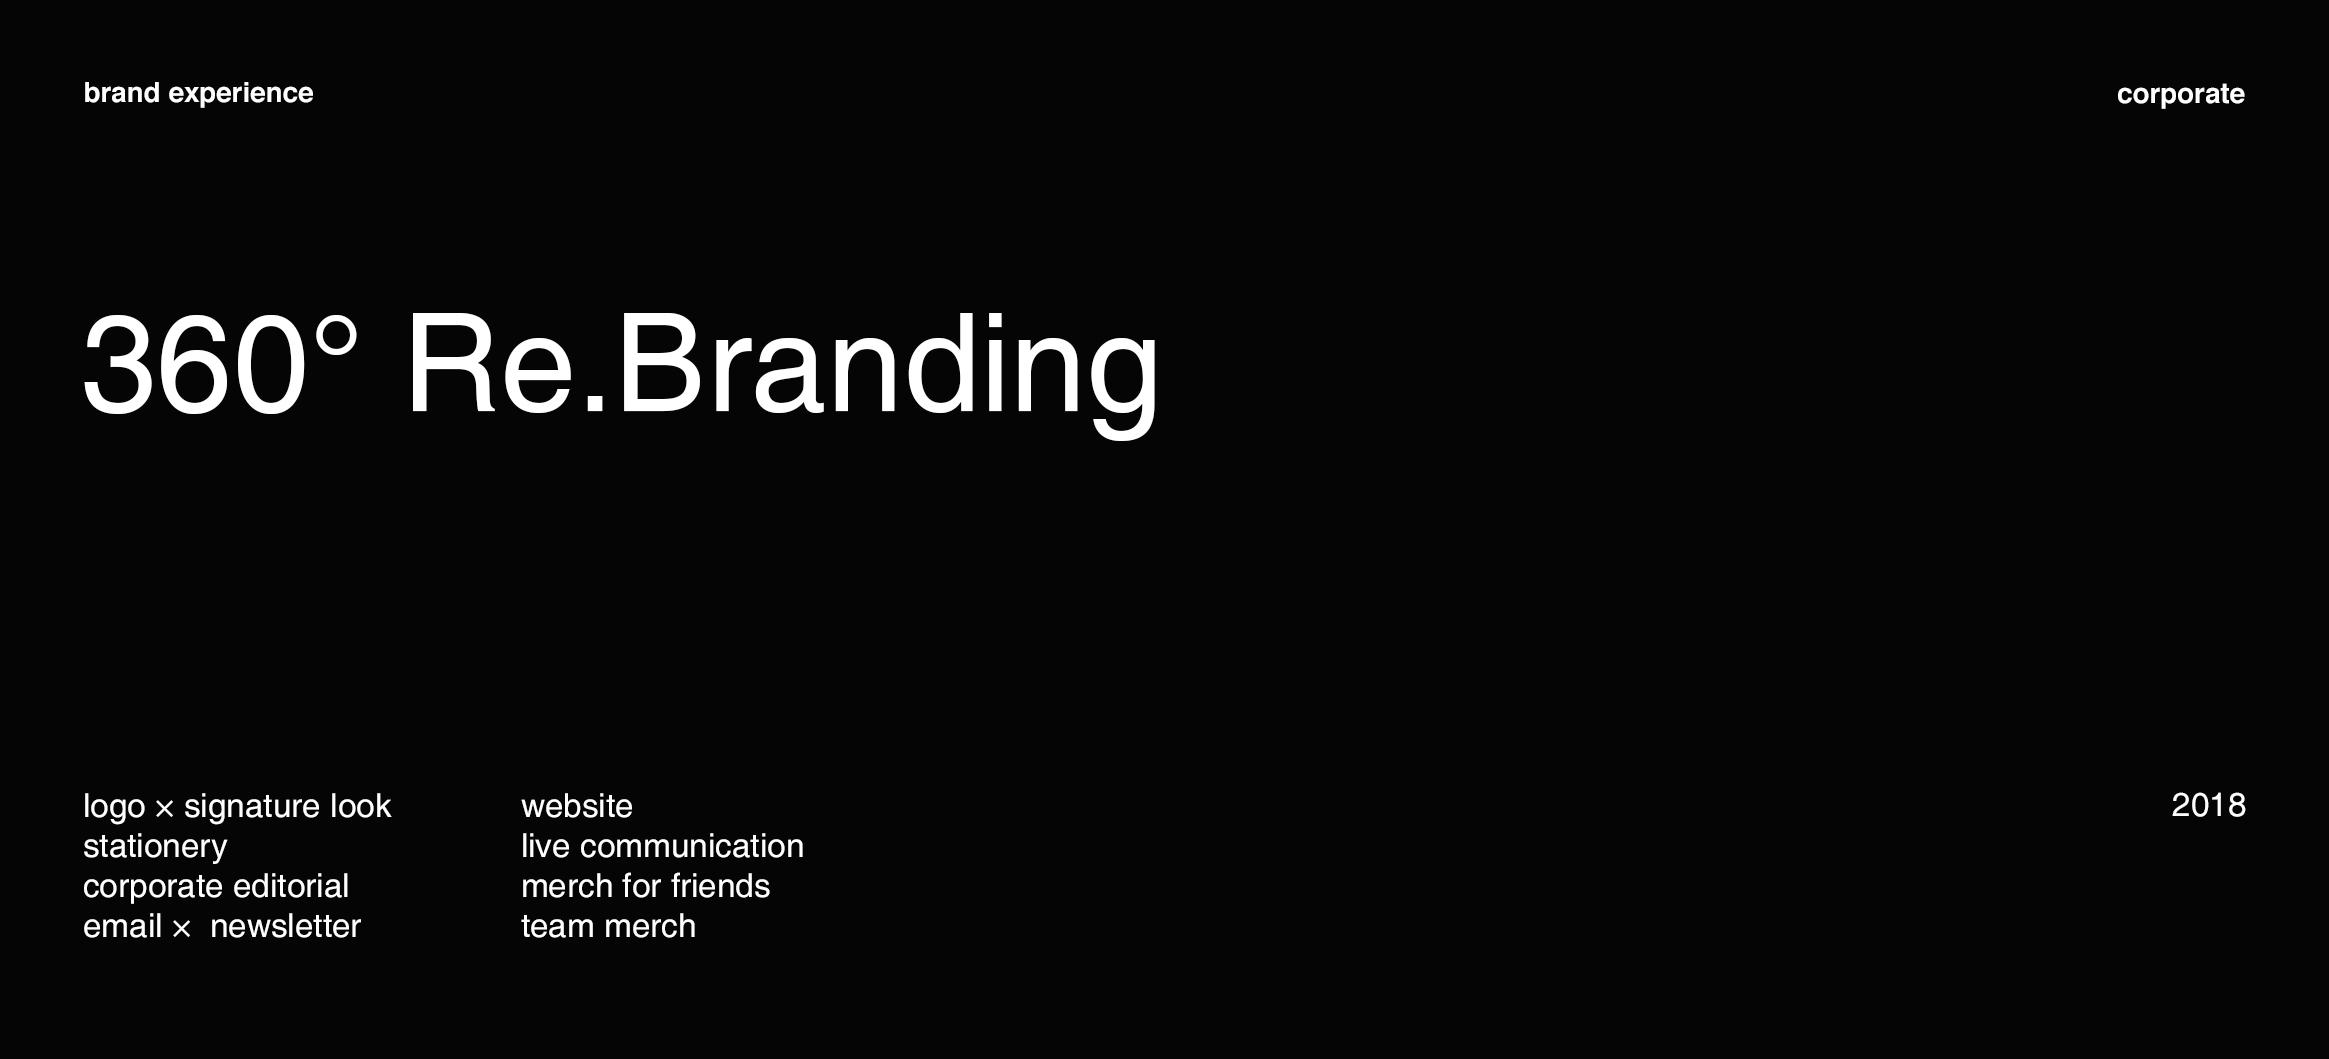 360° Re.Branding for B2B Agency APTLY